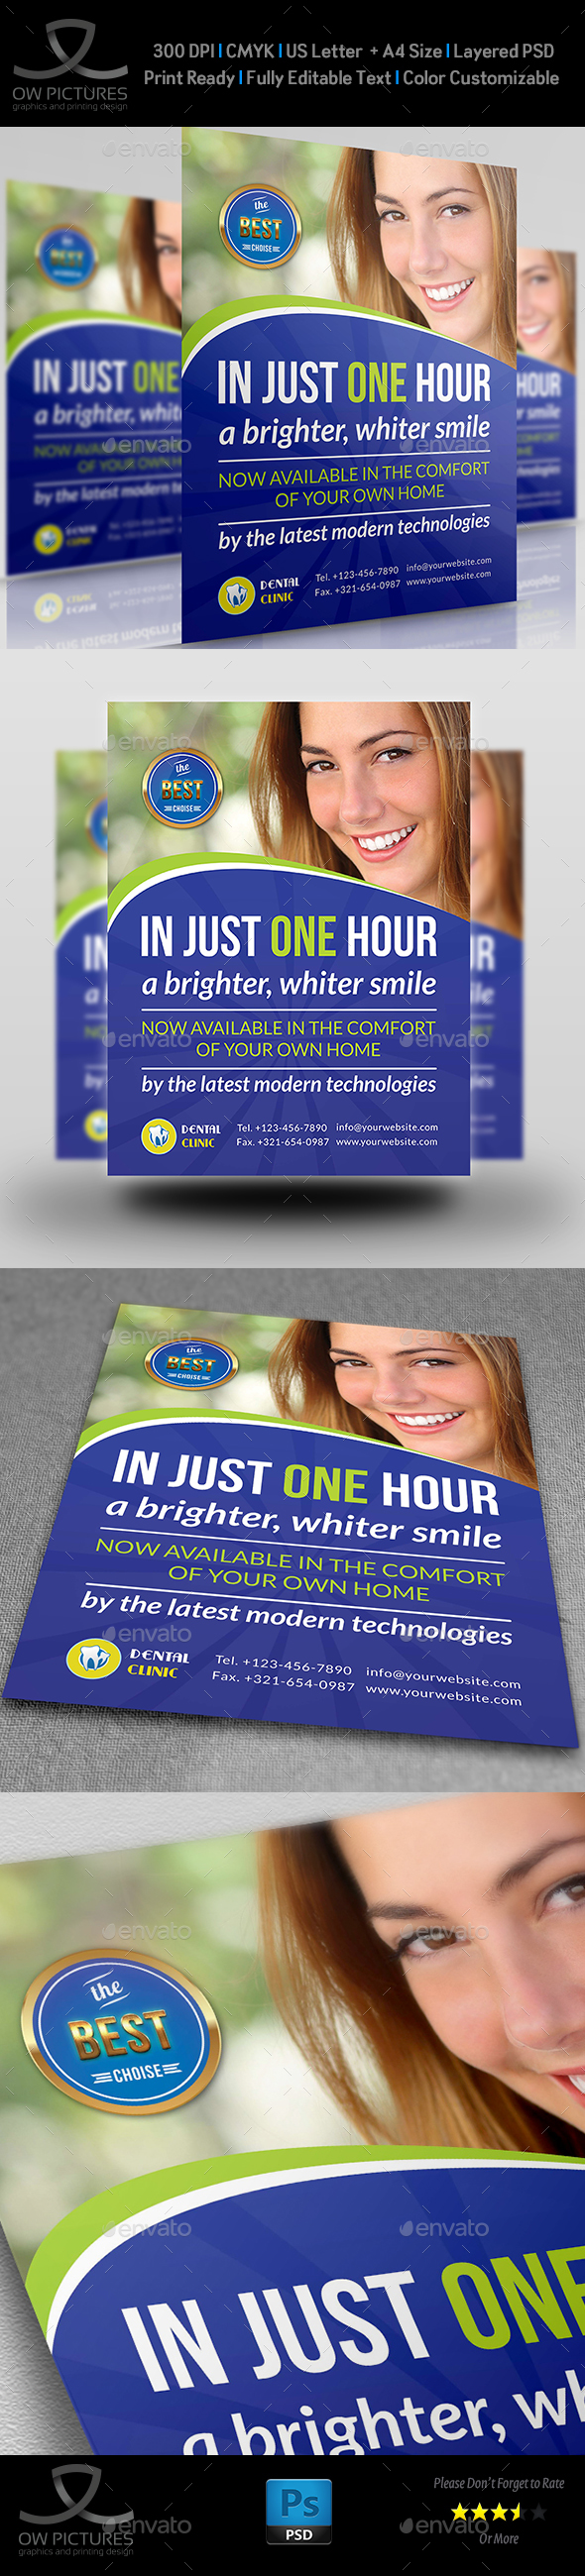 Dental Clinic Flyer Vol.2 Template - Flyers Print Templates